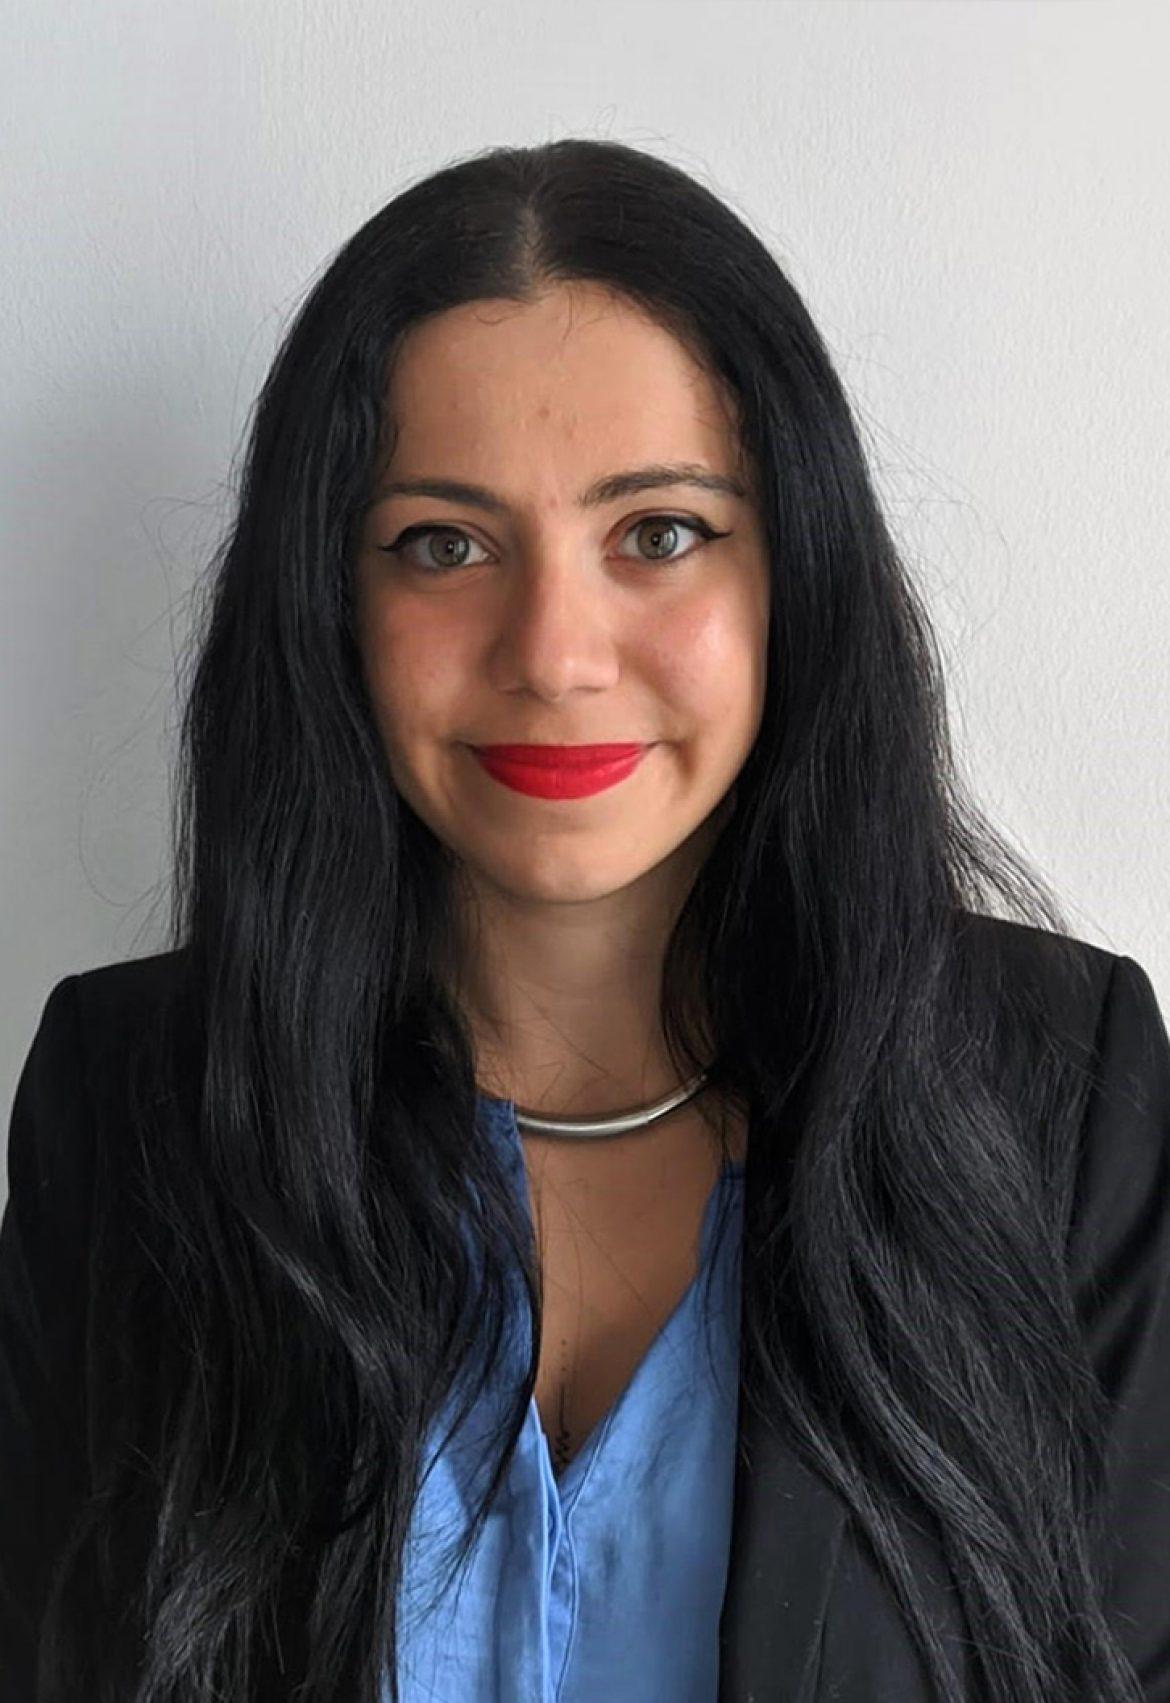 Irene Jardí Toledano